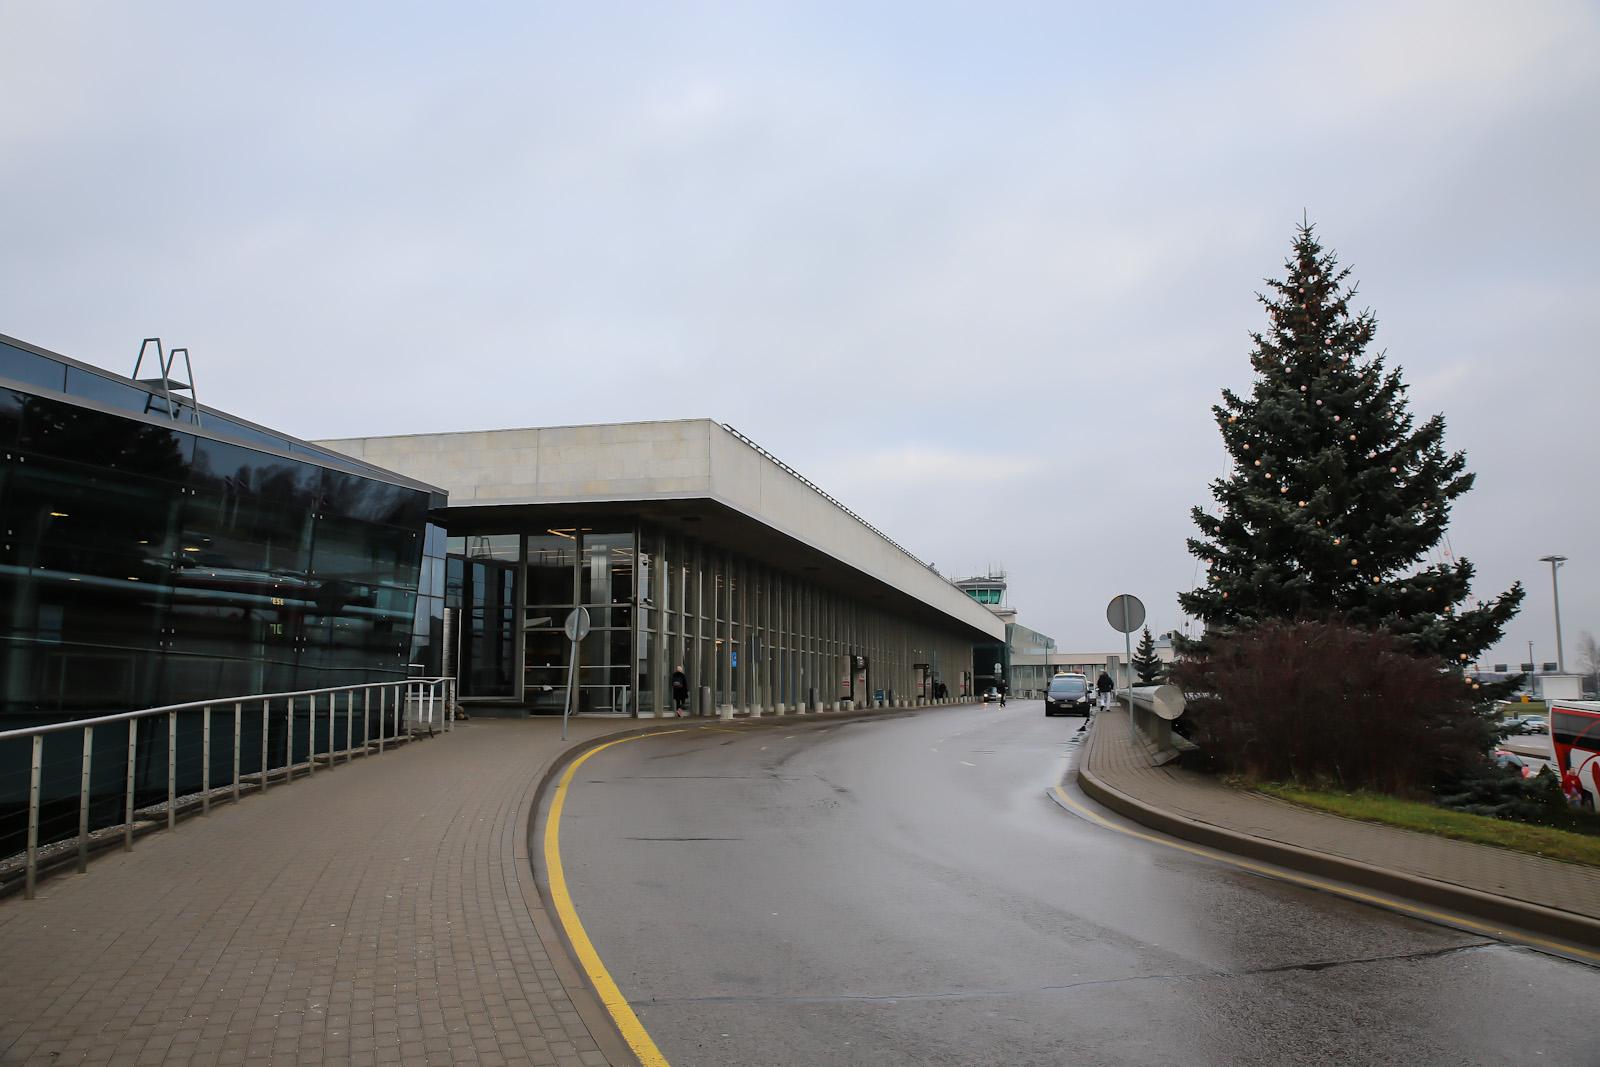 Аэровокзал аэропорта Рига